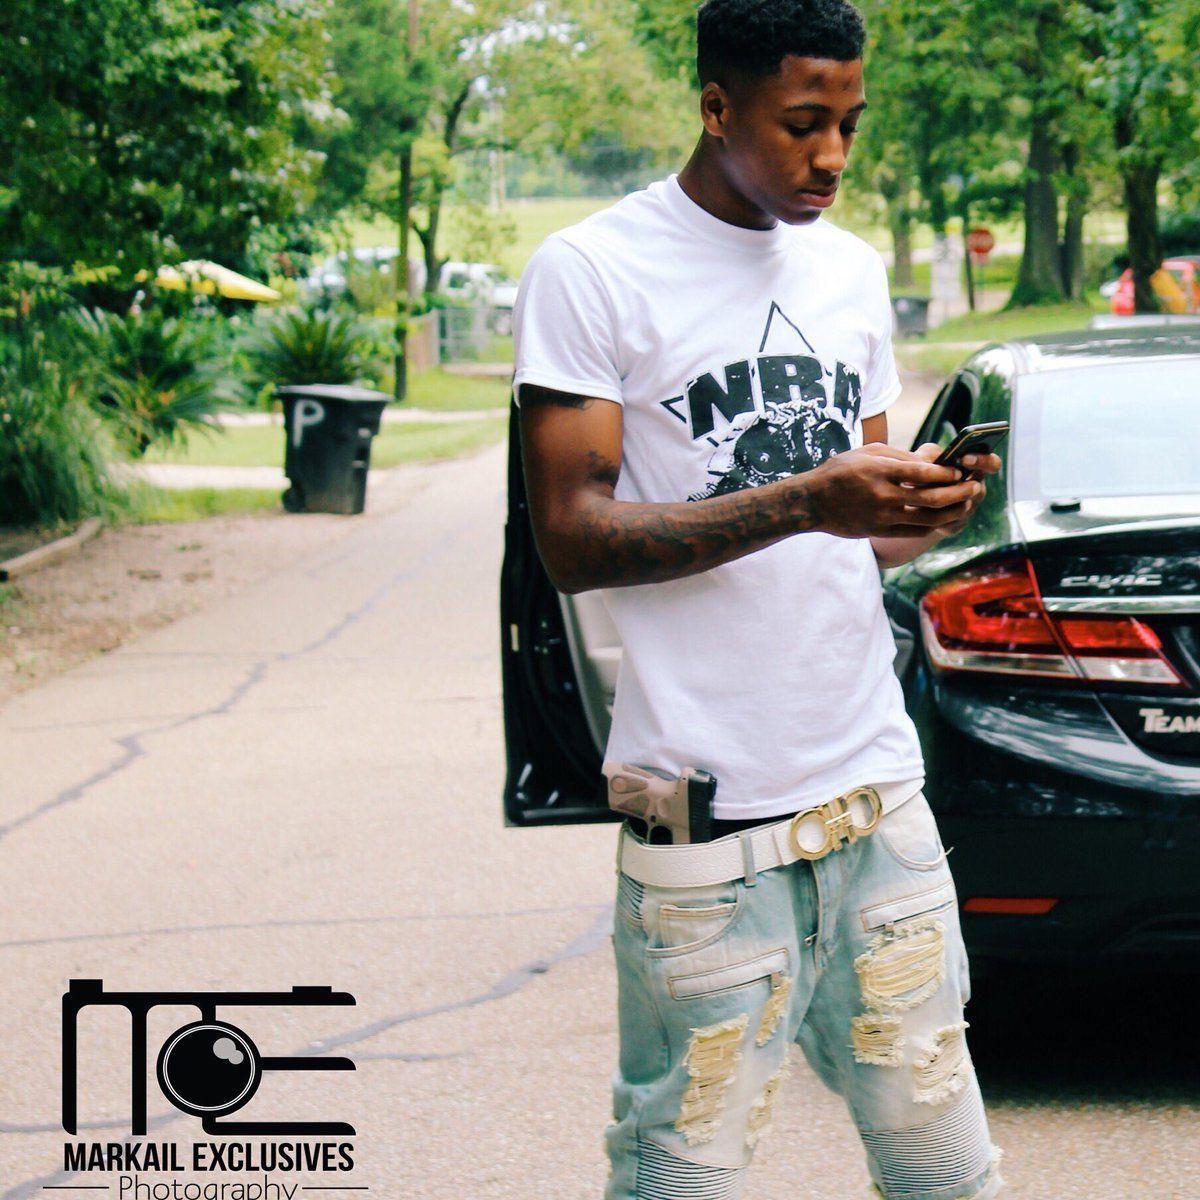 Nba Young Boy Rapper Wallpapers Top Free Nba Young Boy Rapper Backgrounds Wallpaperaccess